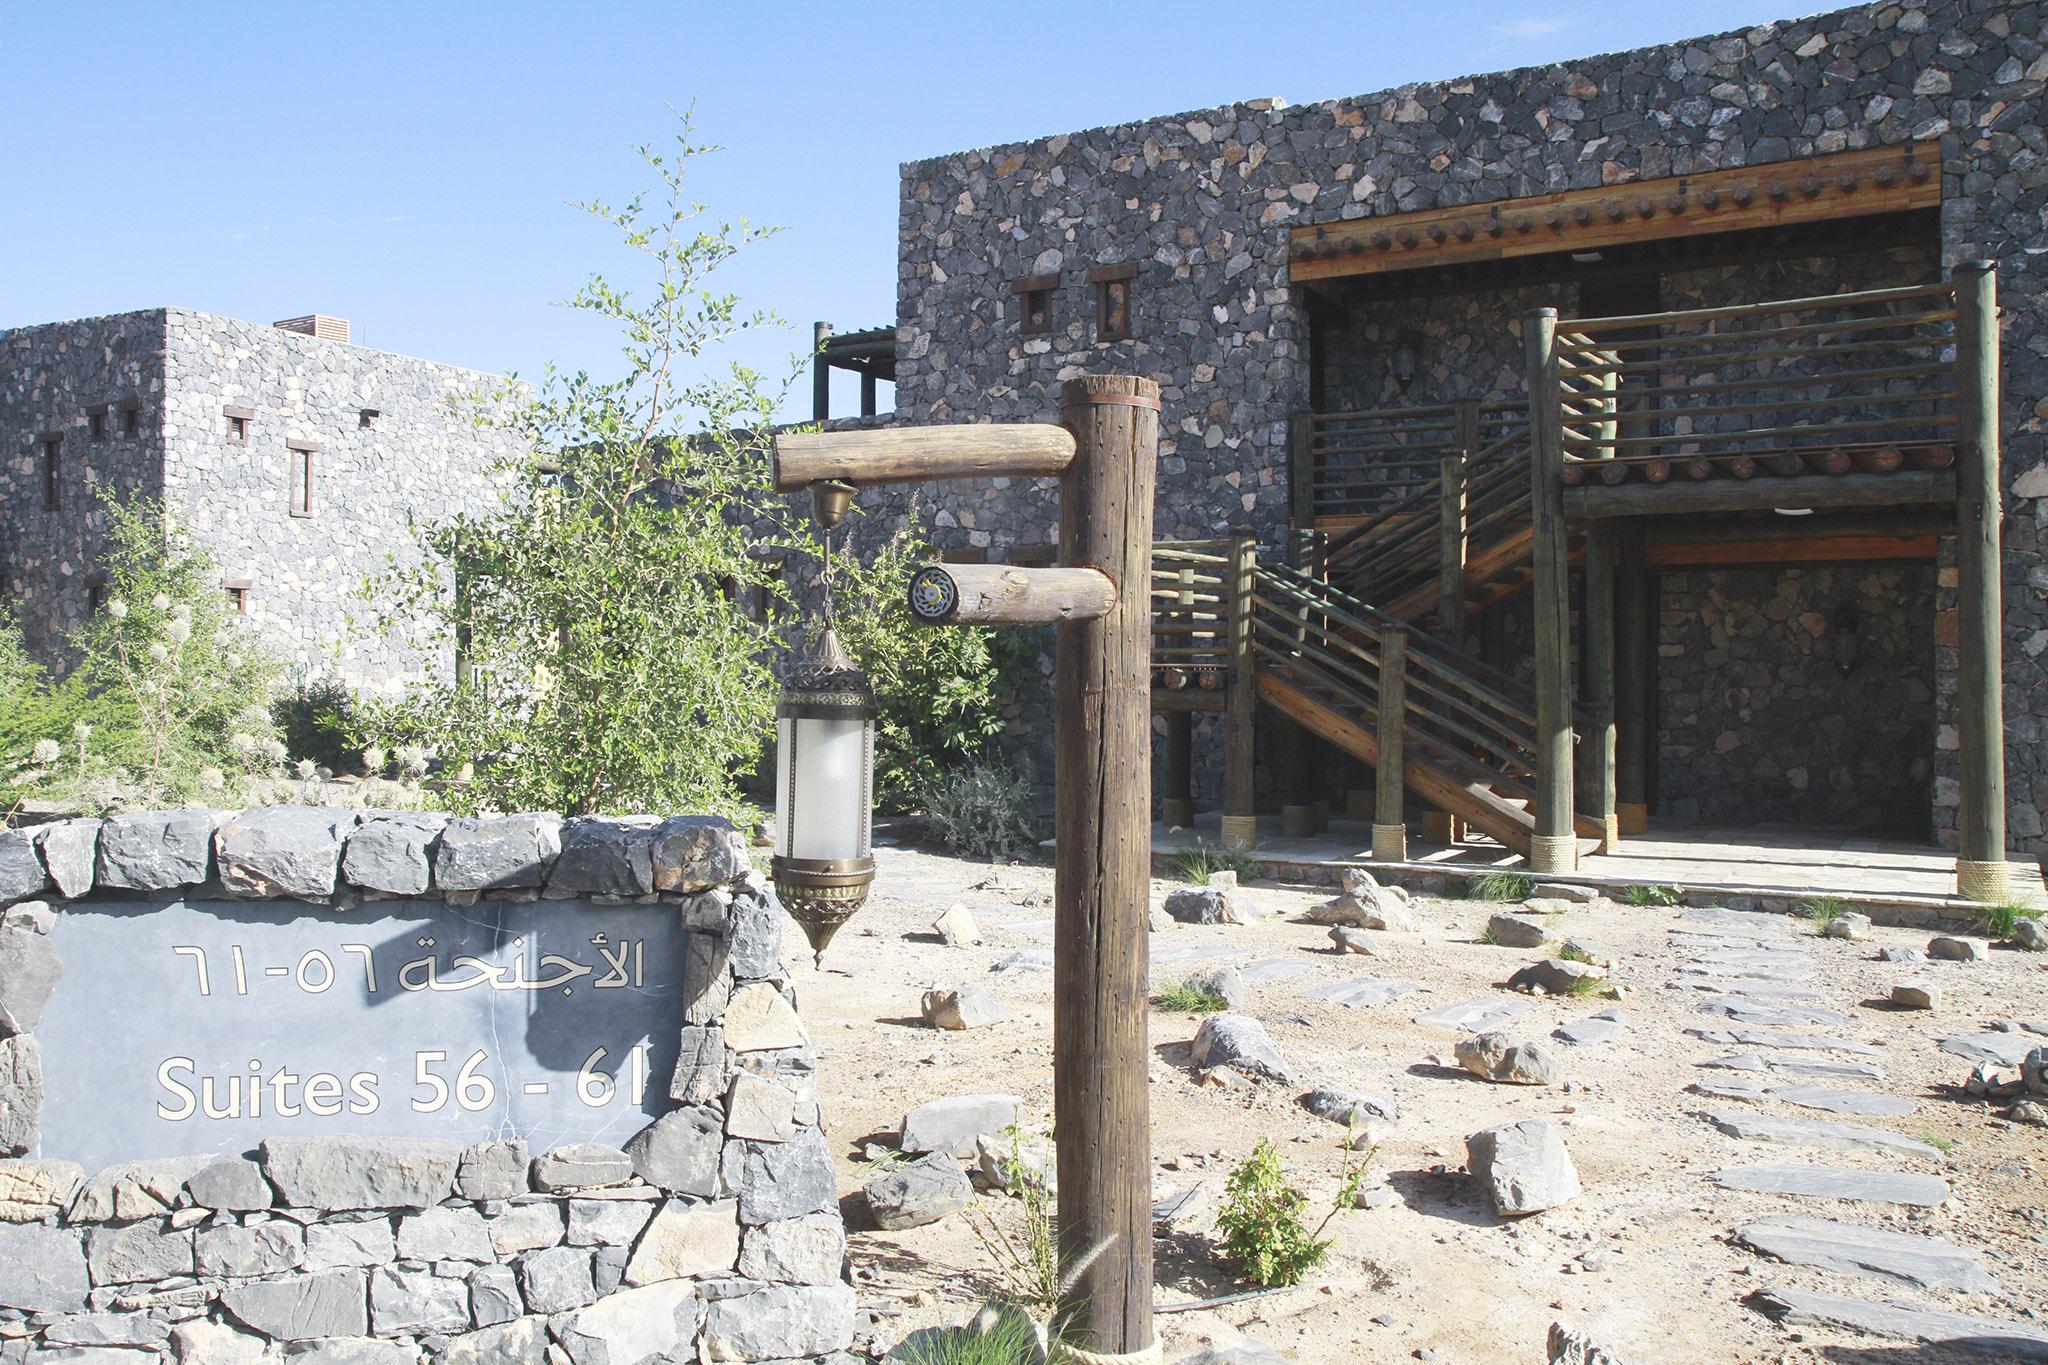 2017-04-Alila-Jabal-Akhdar - alila-jabal-akhdar-oman-nectarandpulse-architecture-3.jpg